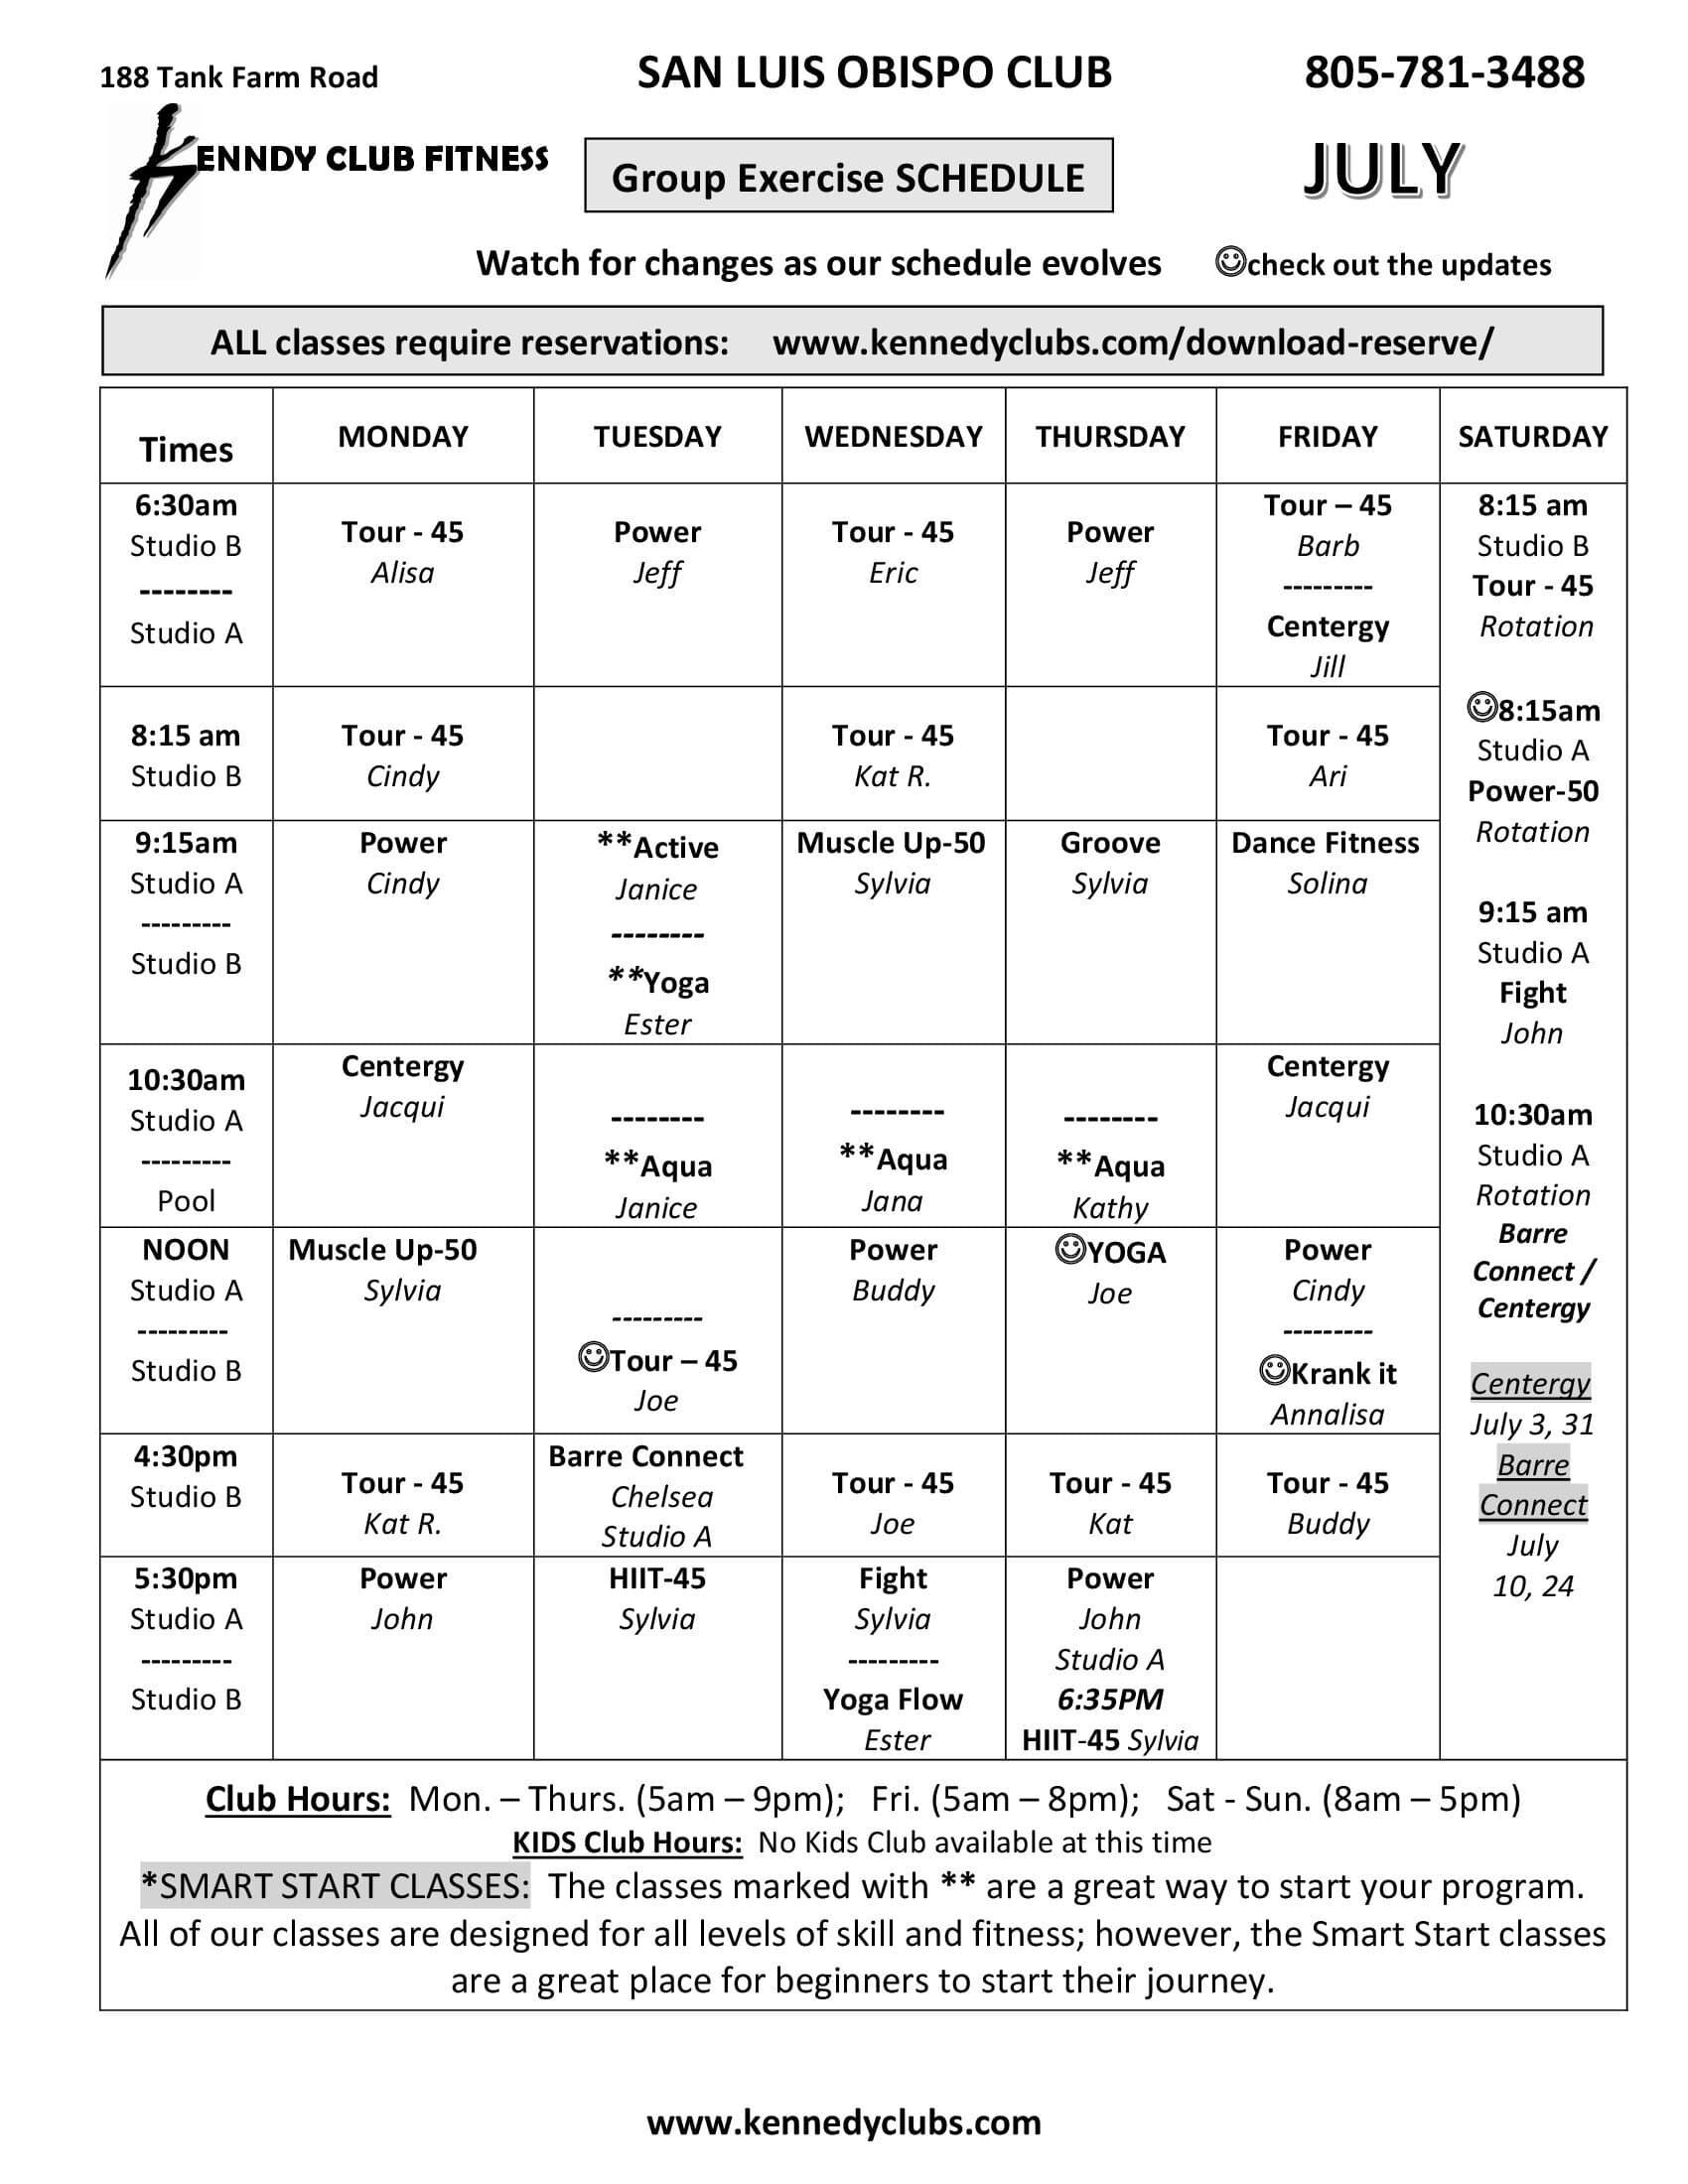 Kennedy Club Fitness San Luis Obispo Group Exercise Schedule 07 2021